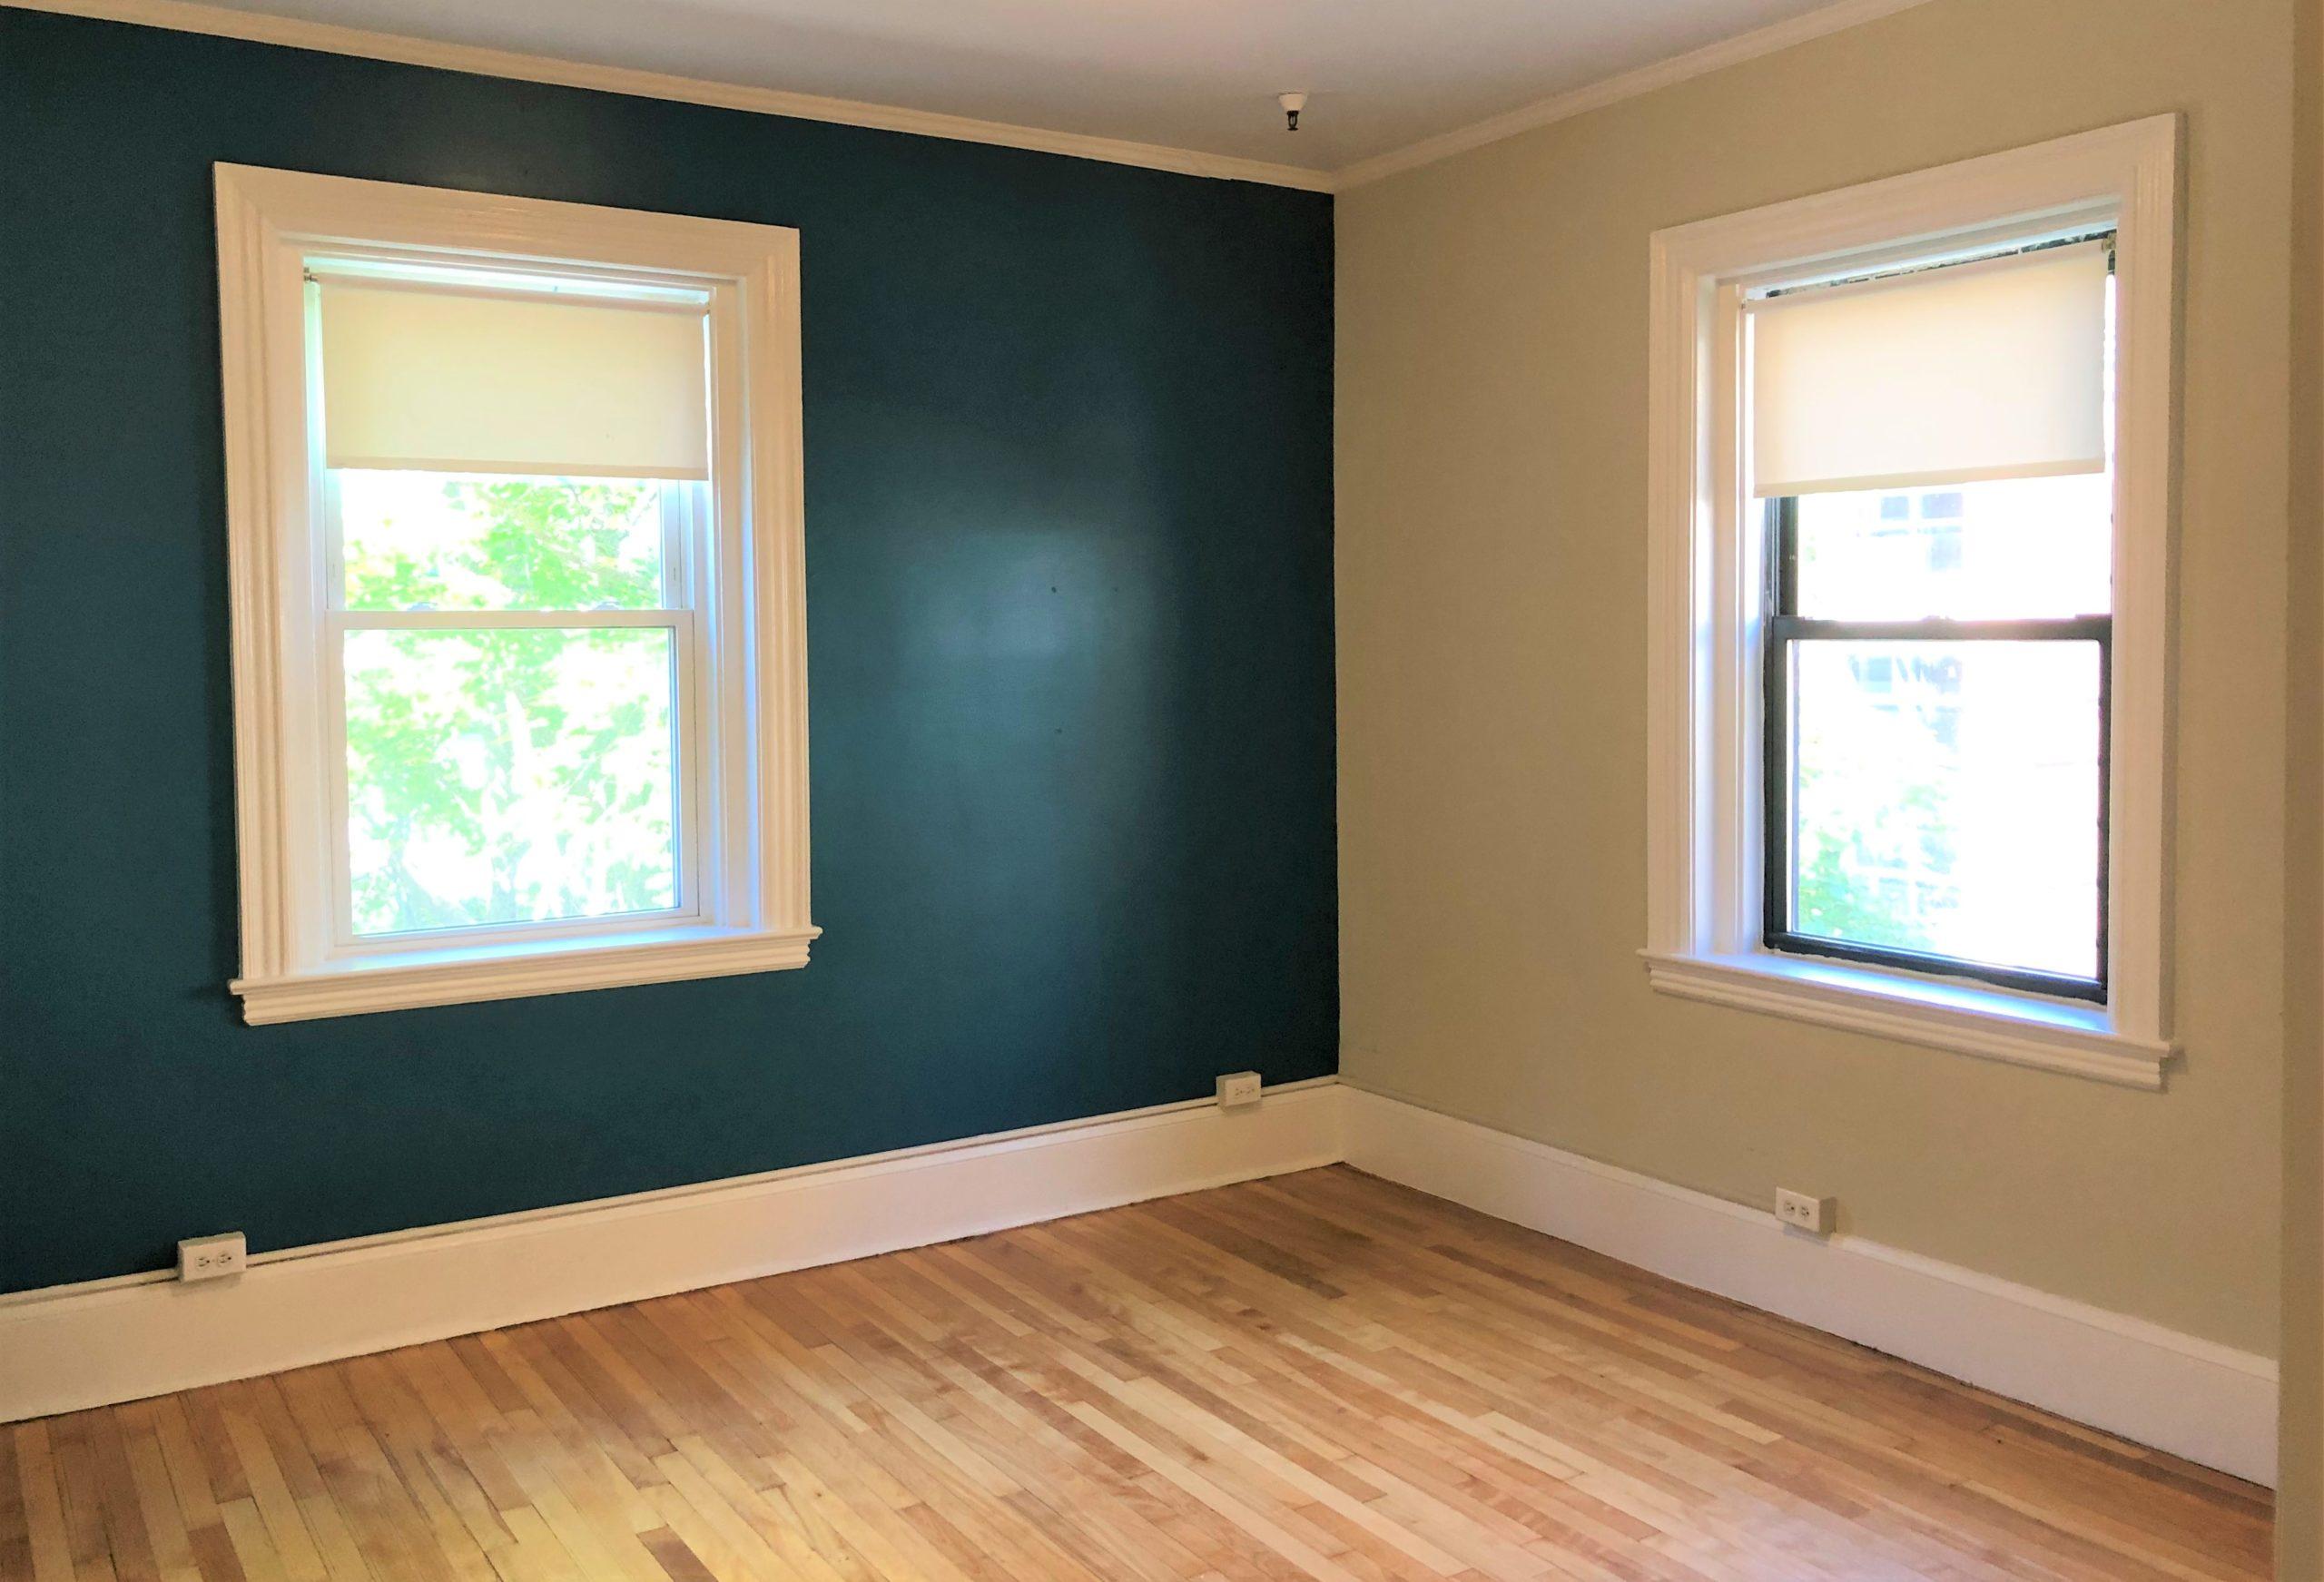 439 Congress Street – Apartment 215